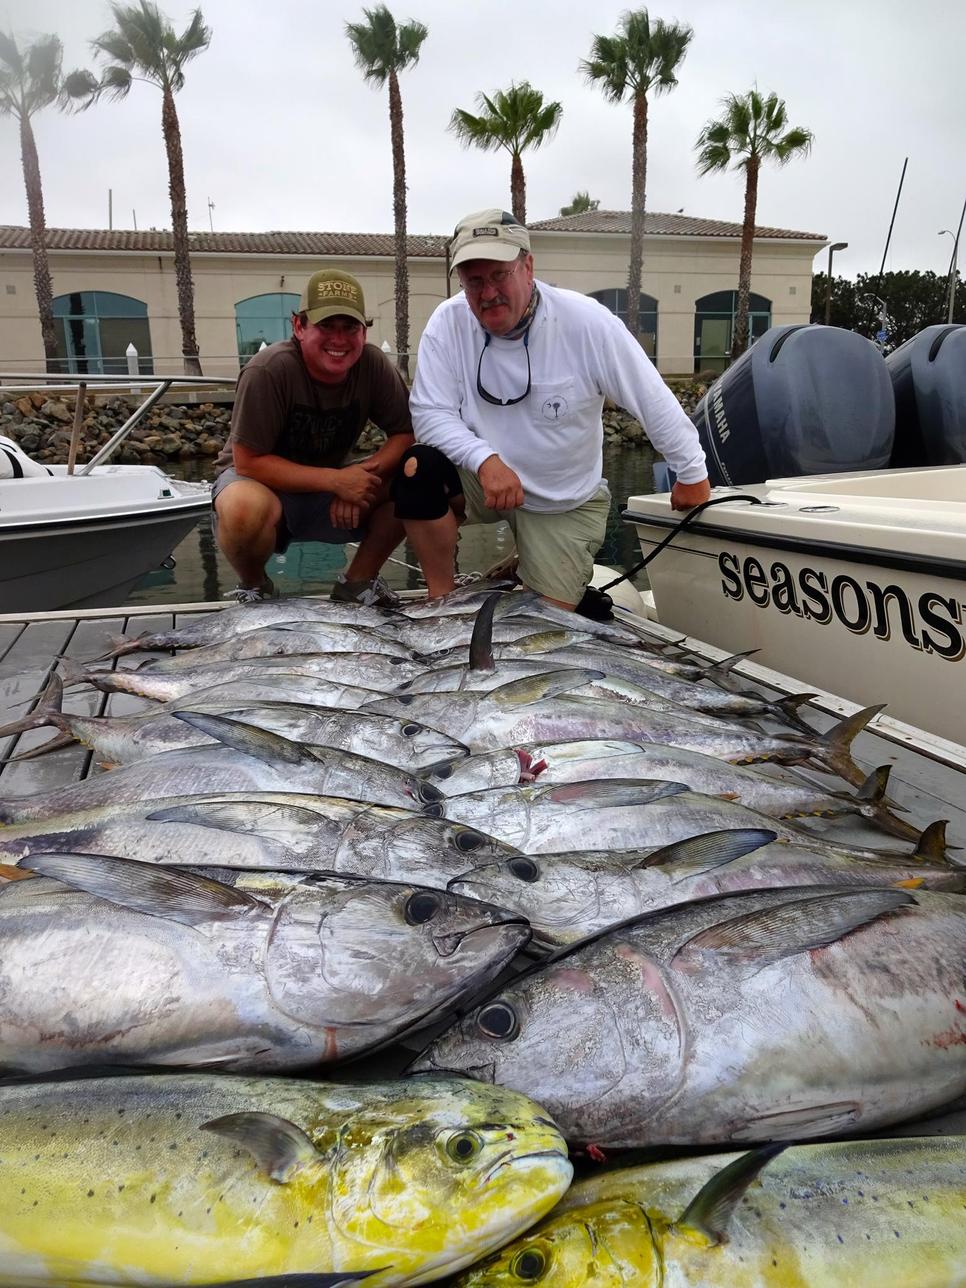 Tuna limits fishing report august 20 2015 fishtrack com for 976 tuna fish report